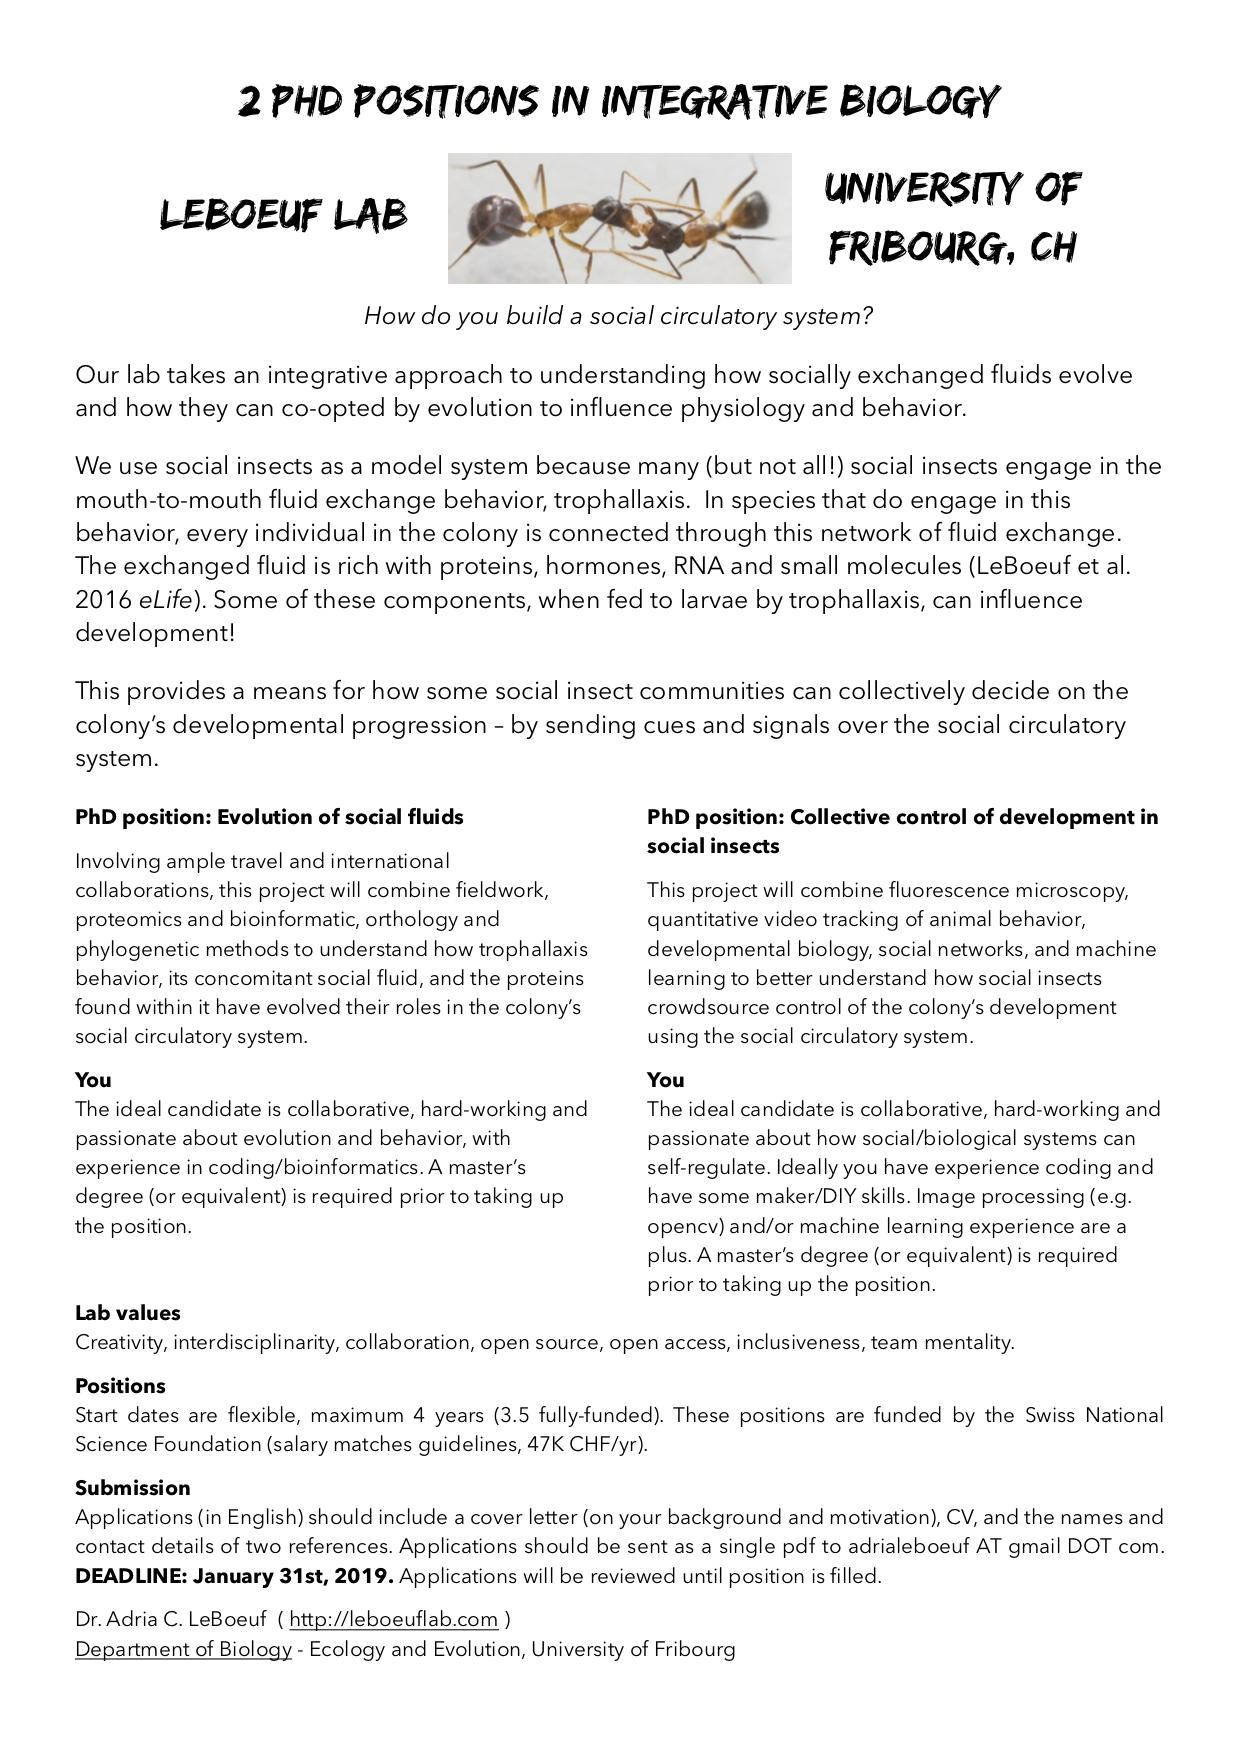 LeBoeuf Lab PhD positionsv3.png